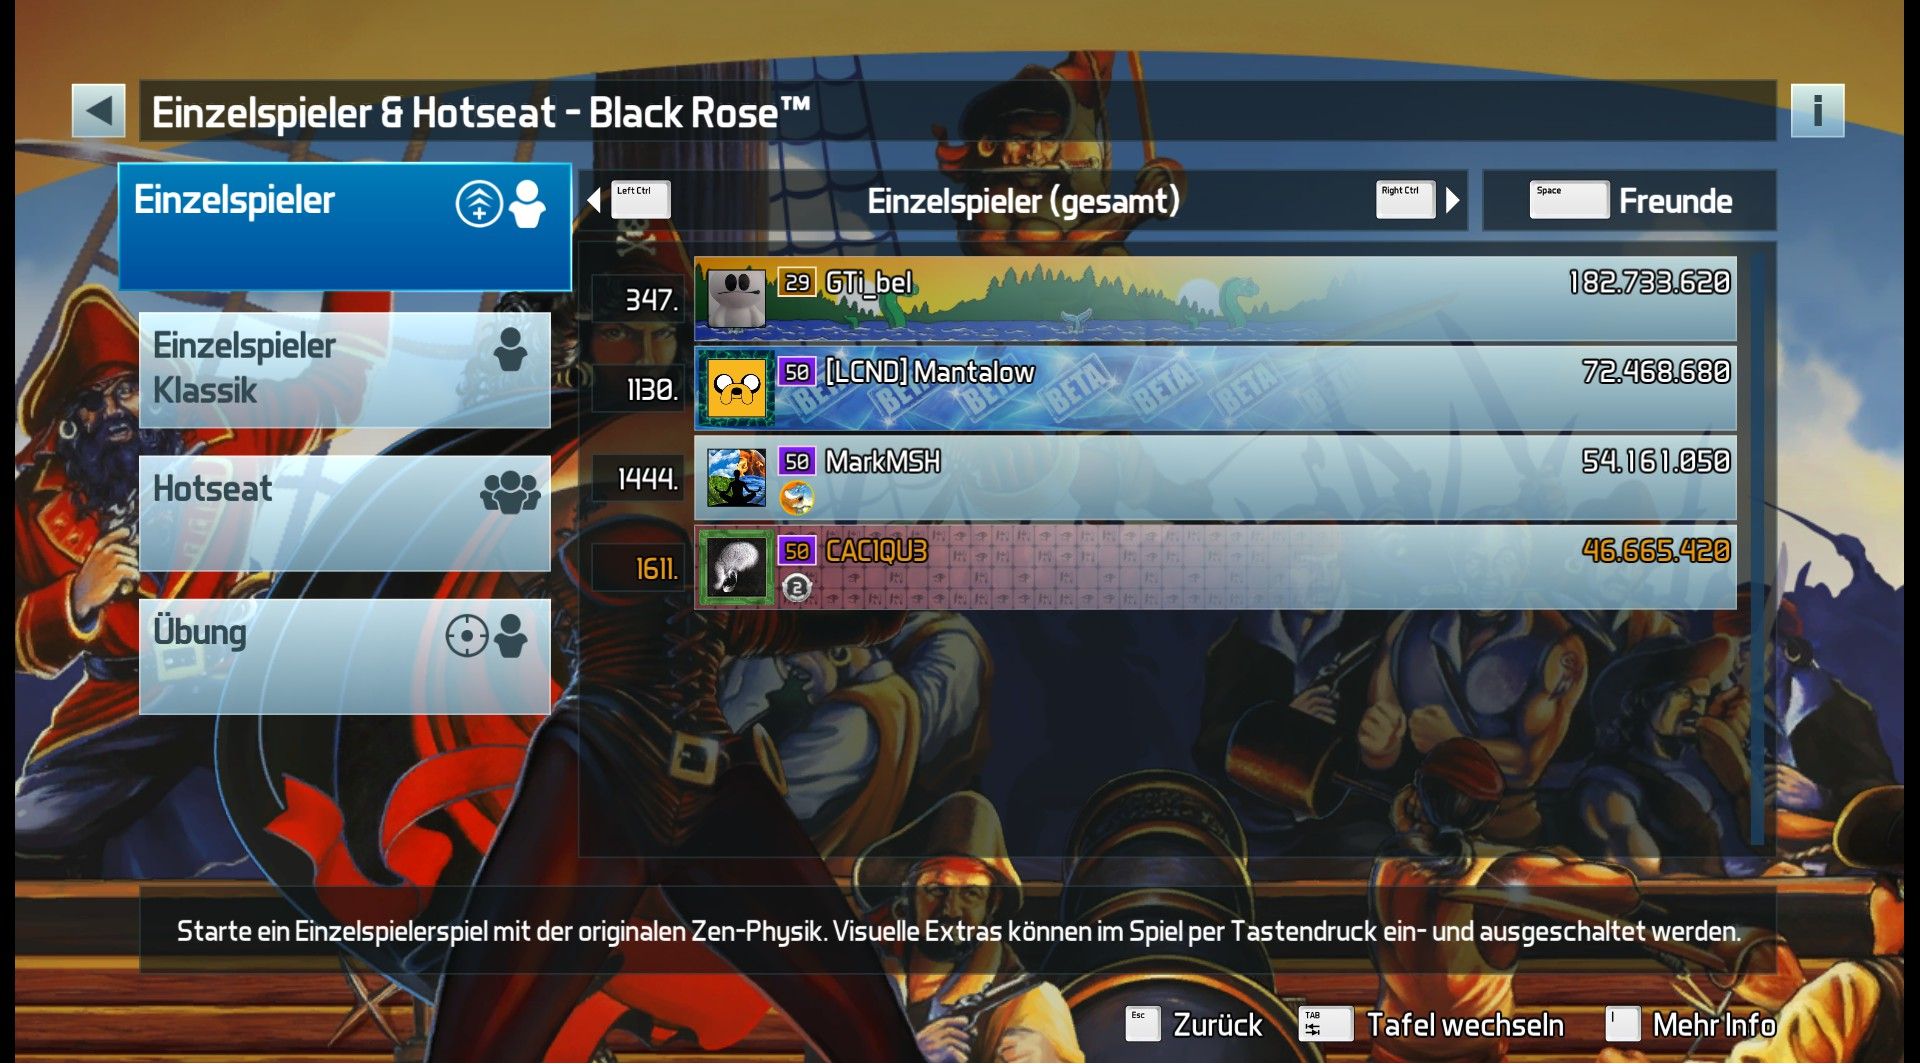 CAC1QU3: Pinball FX3: Black Rose [Standard] (PC) 46,665,420 points on 2019-04-25 10:21:17